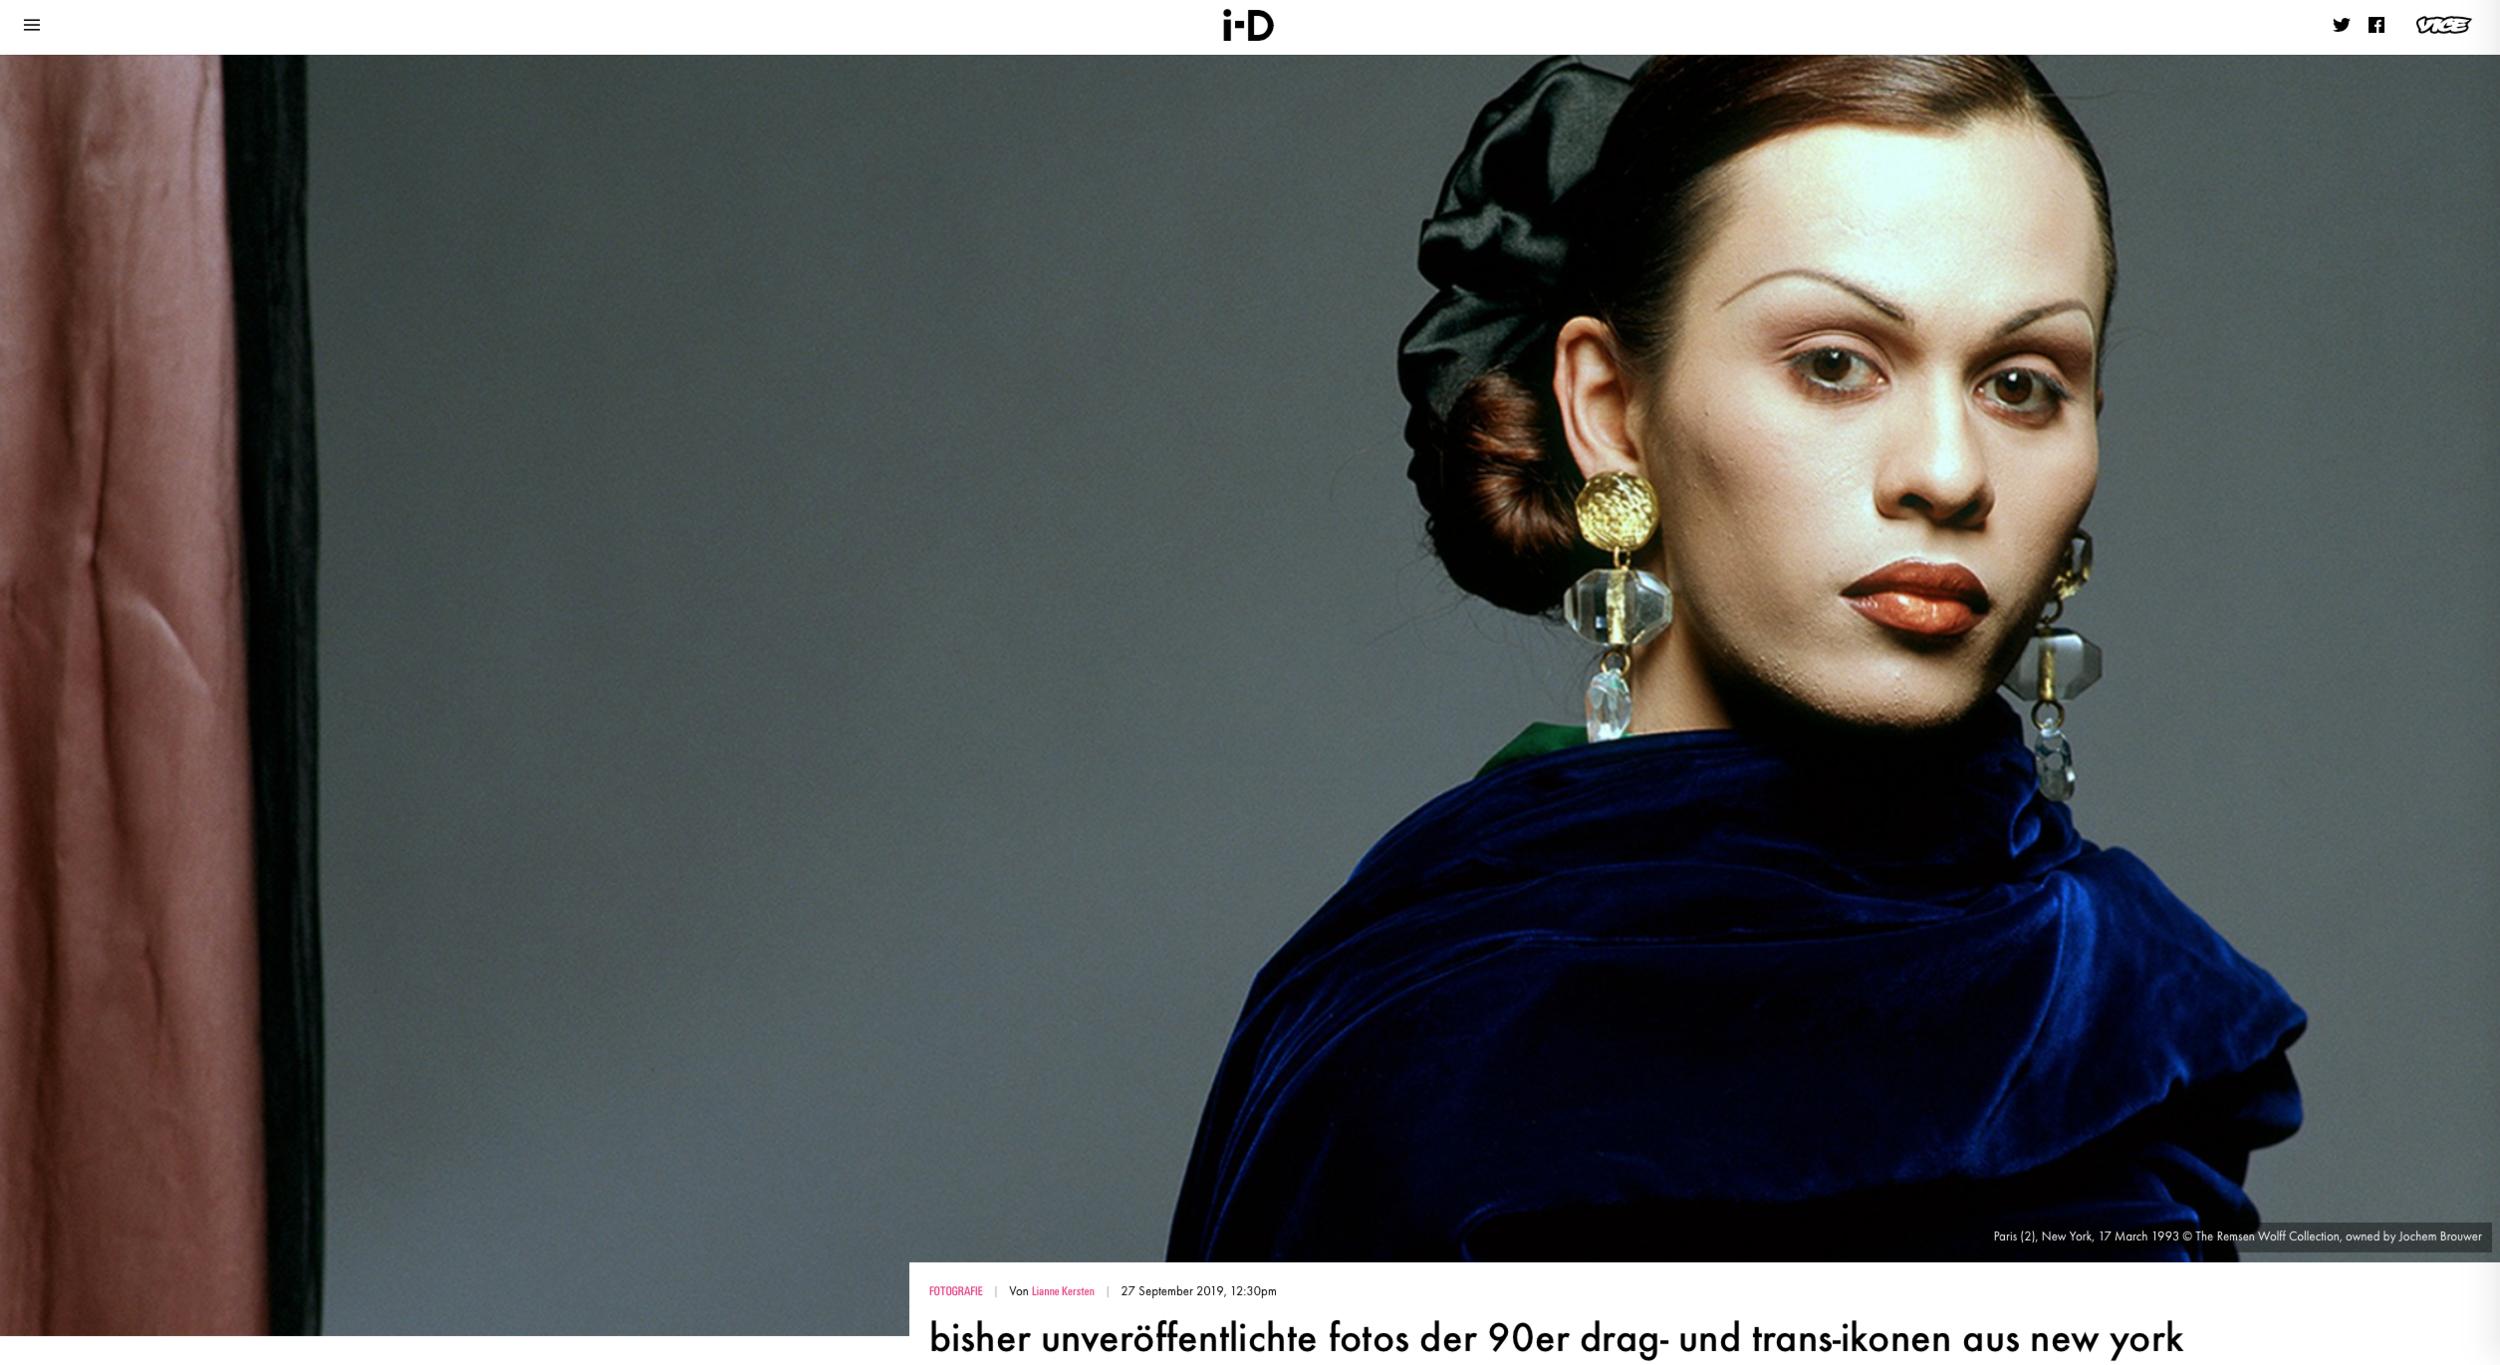 https://i-d.vice.com/de/article/3k335w/remsen-wolff-fotografie-new-york-drag-queens-trans-ikonen